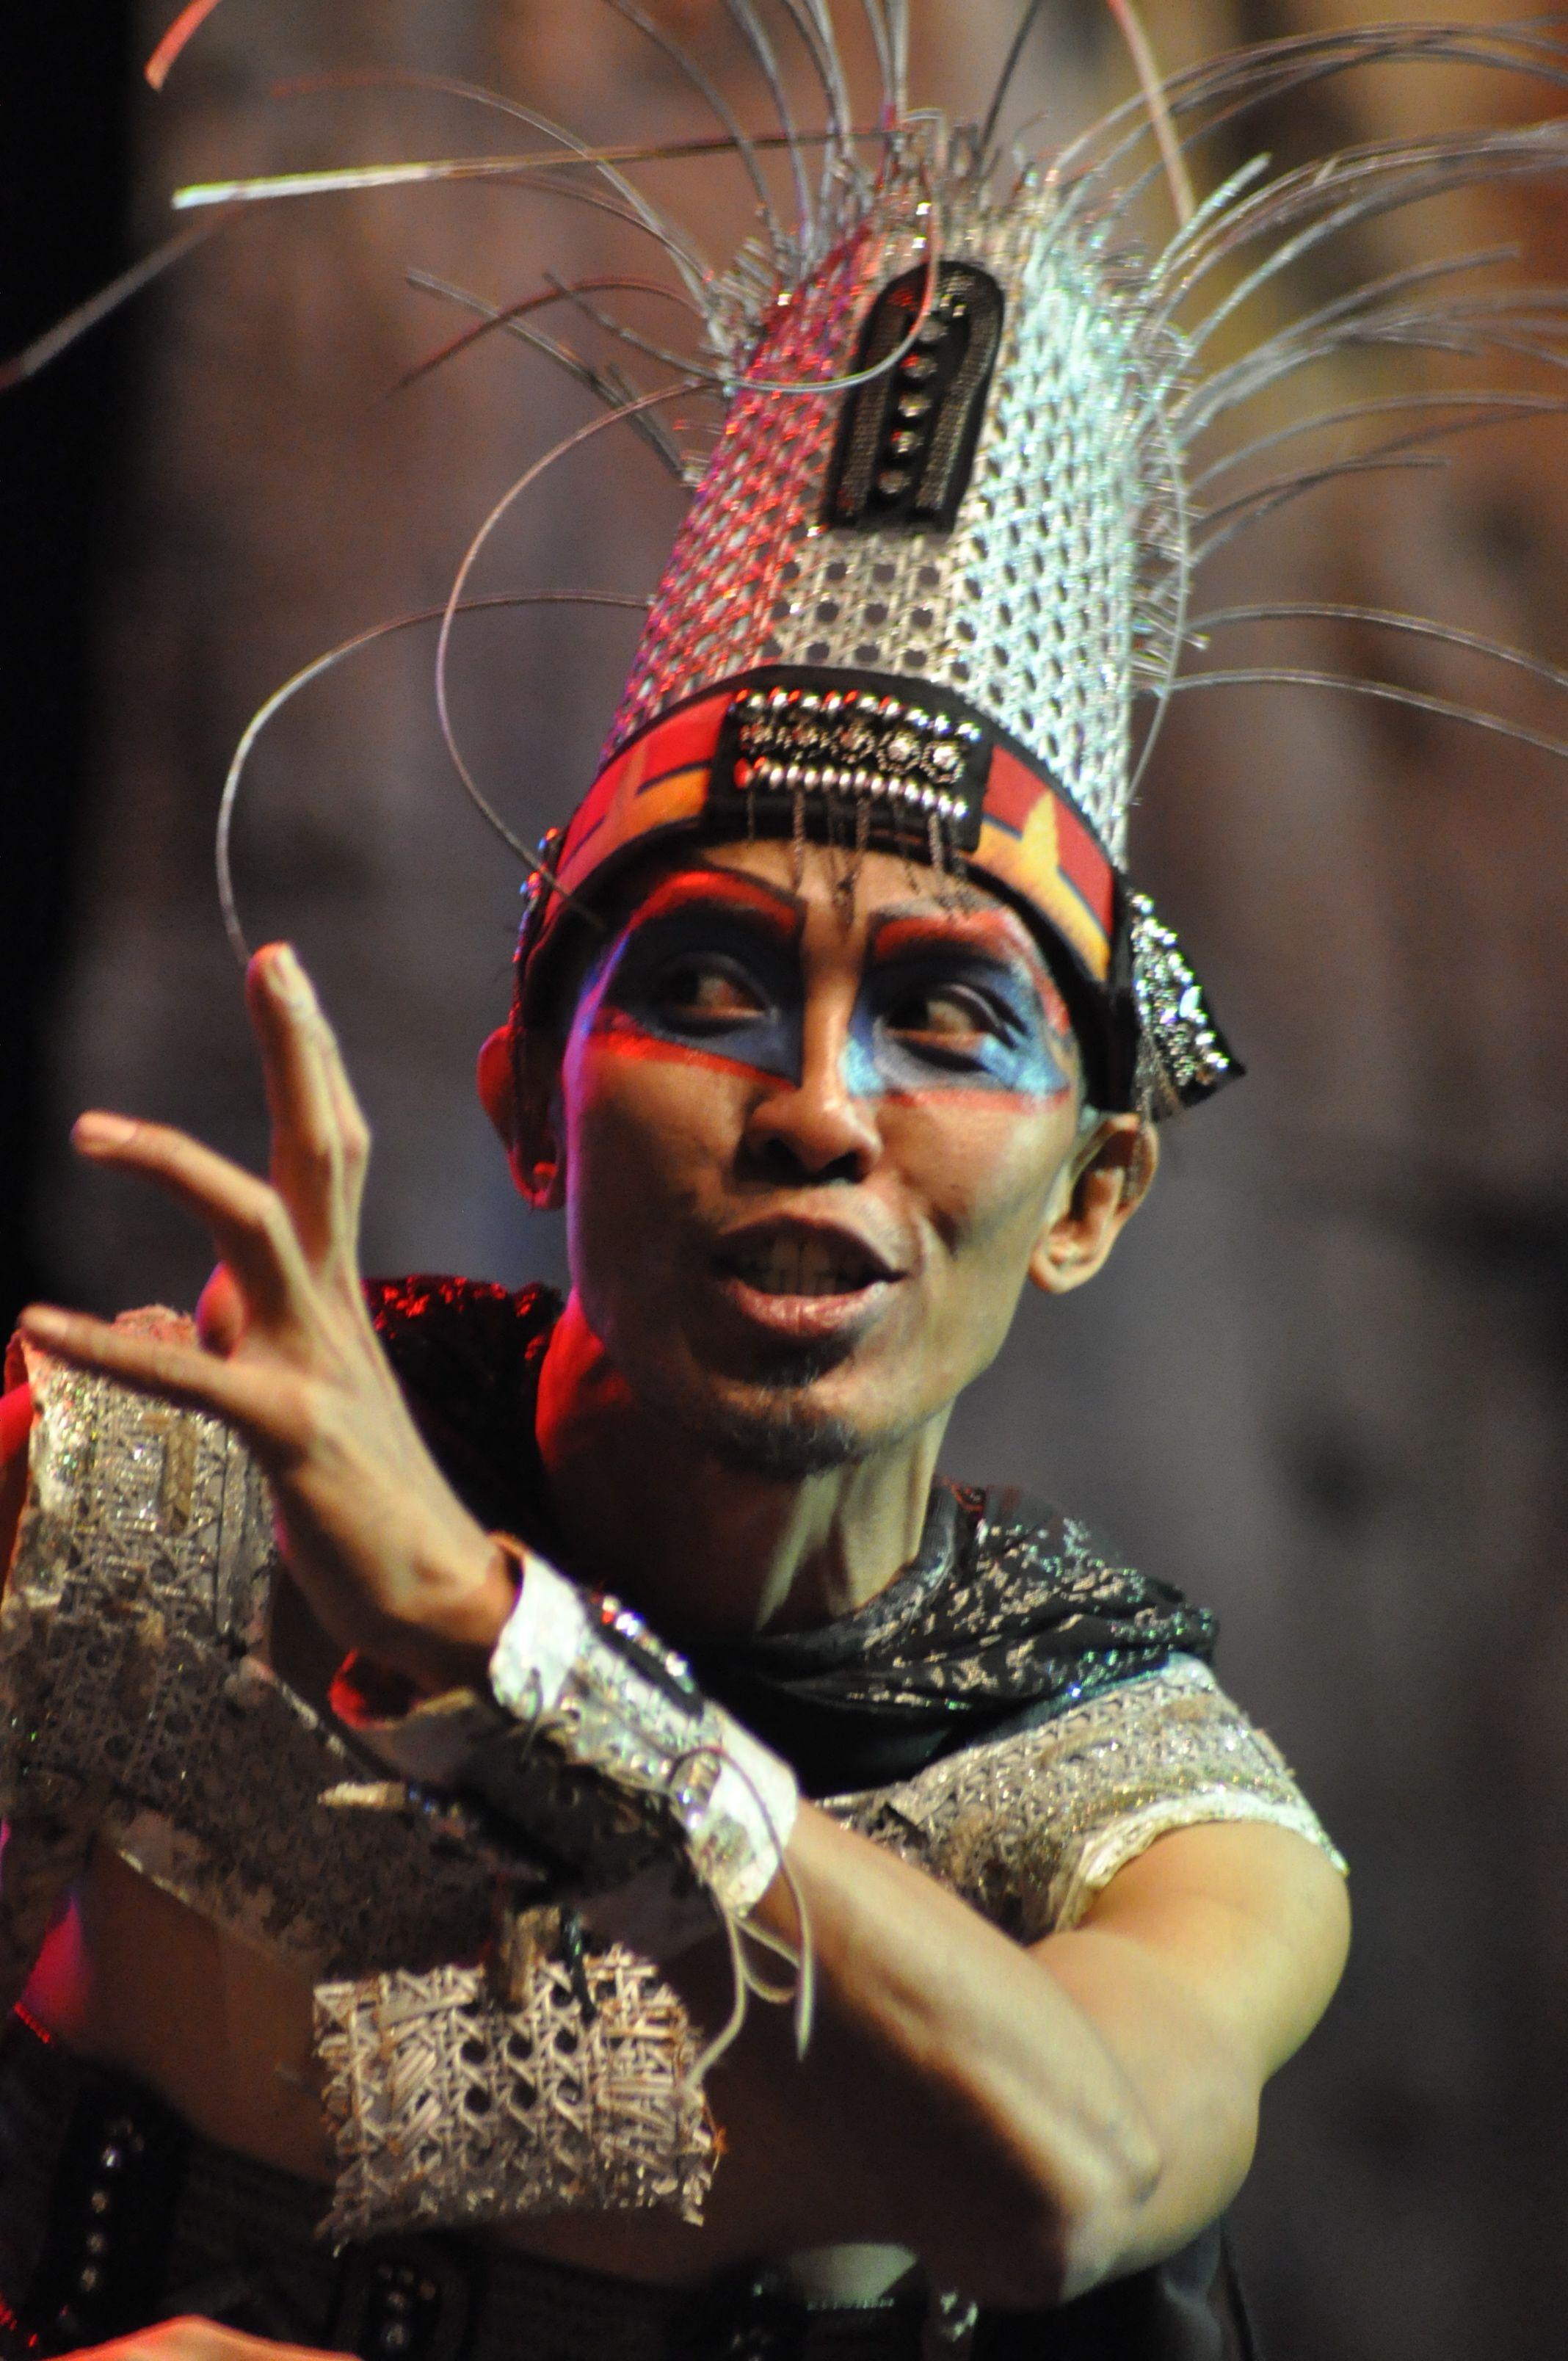 Musical at TransTV Studio, Bandung Crown jewelry